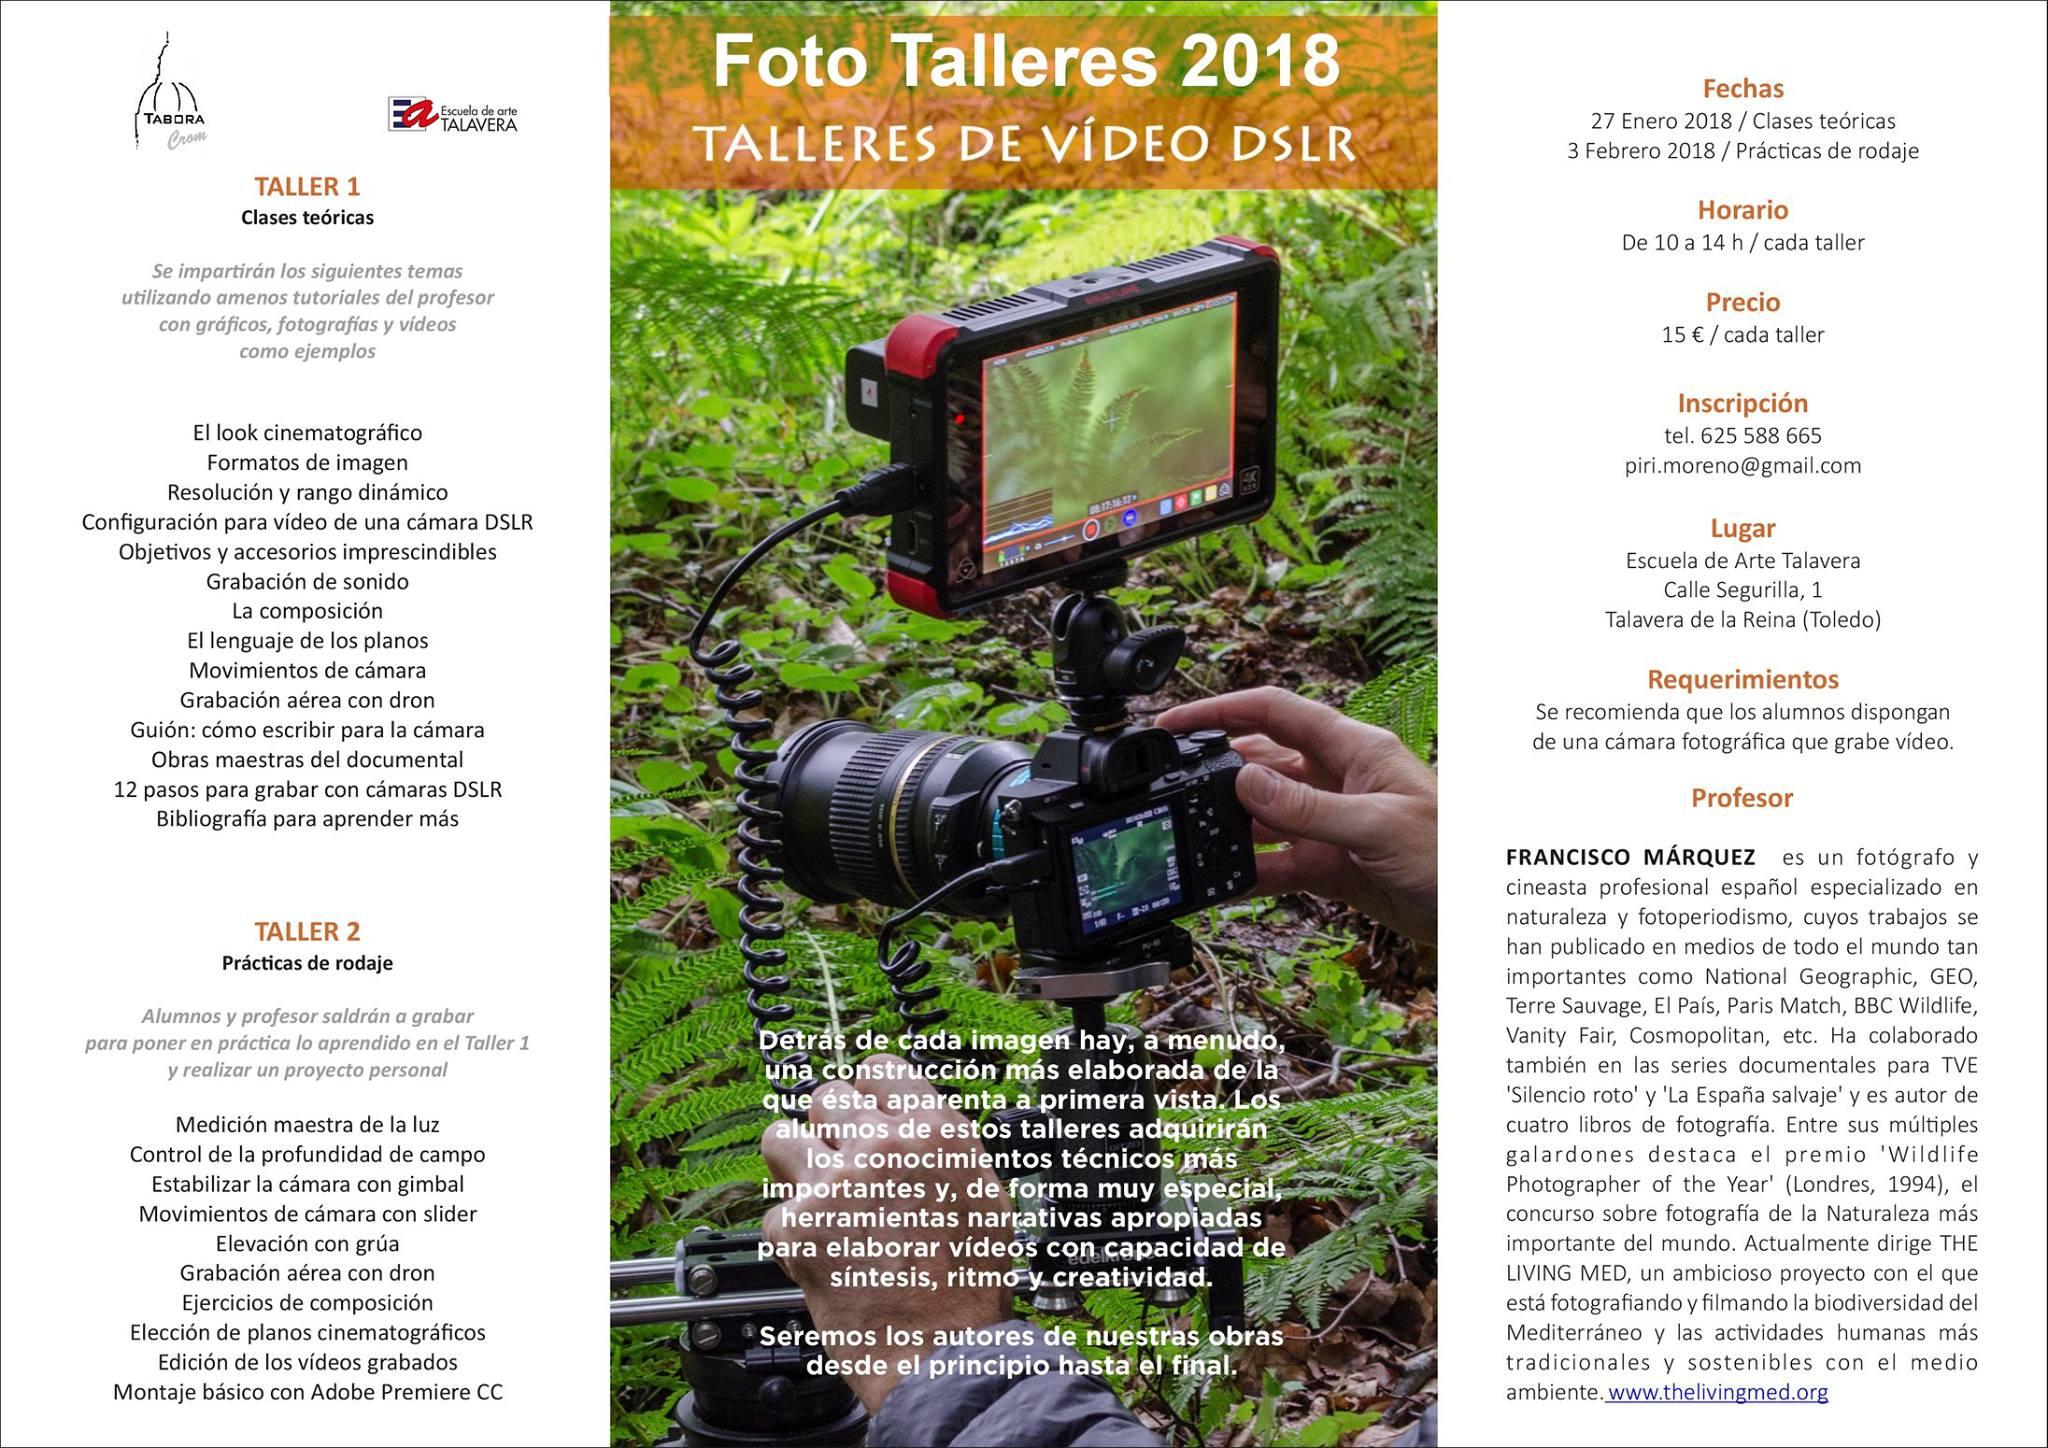 Foto Talleres 2018, Escuela de Arte de Talavera